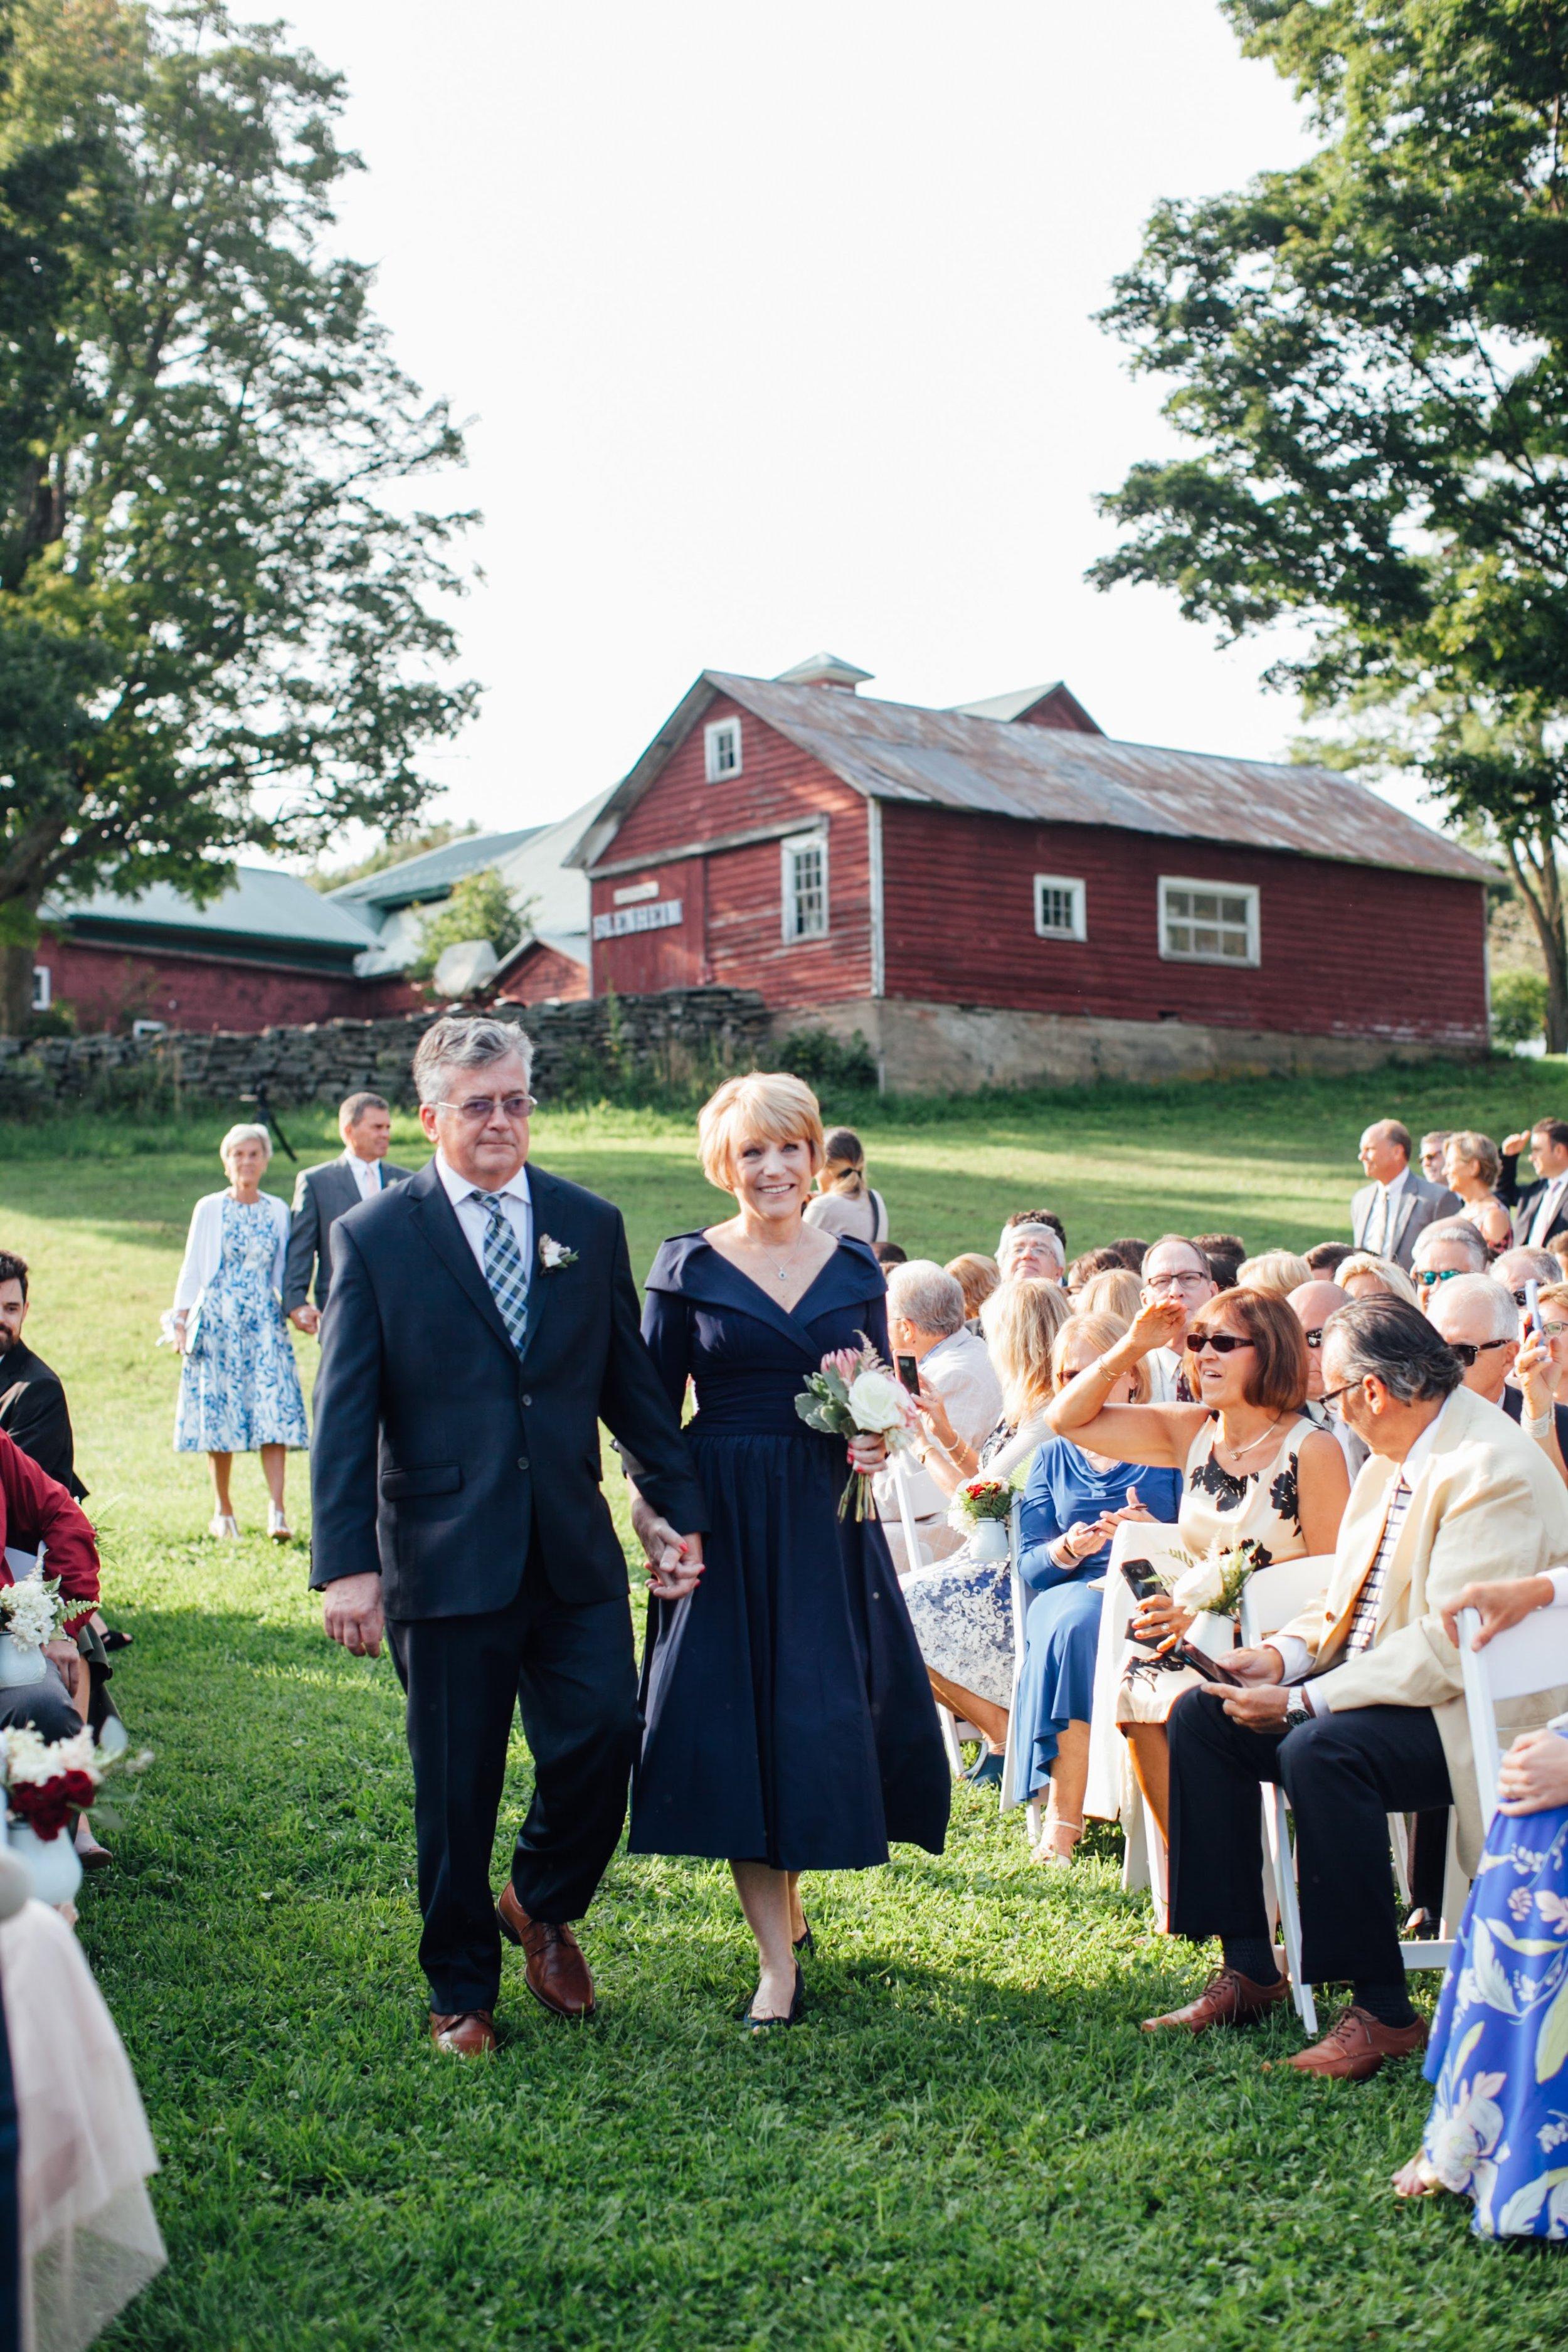 Courtney + Matt Blenheim Hill Farm Catskills NY Wedding Veronica Lola Photography 2017-349.jpg